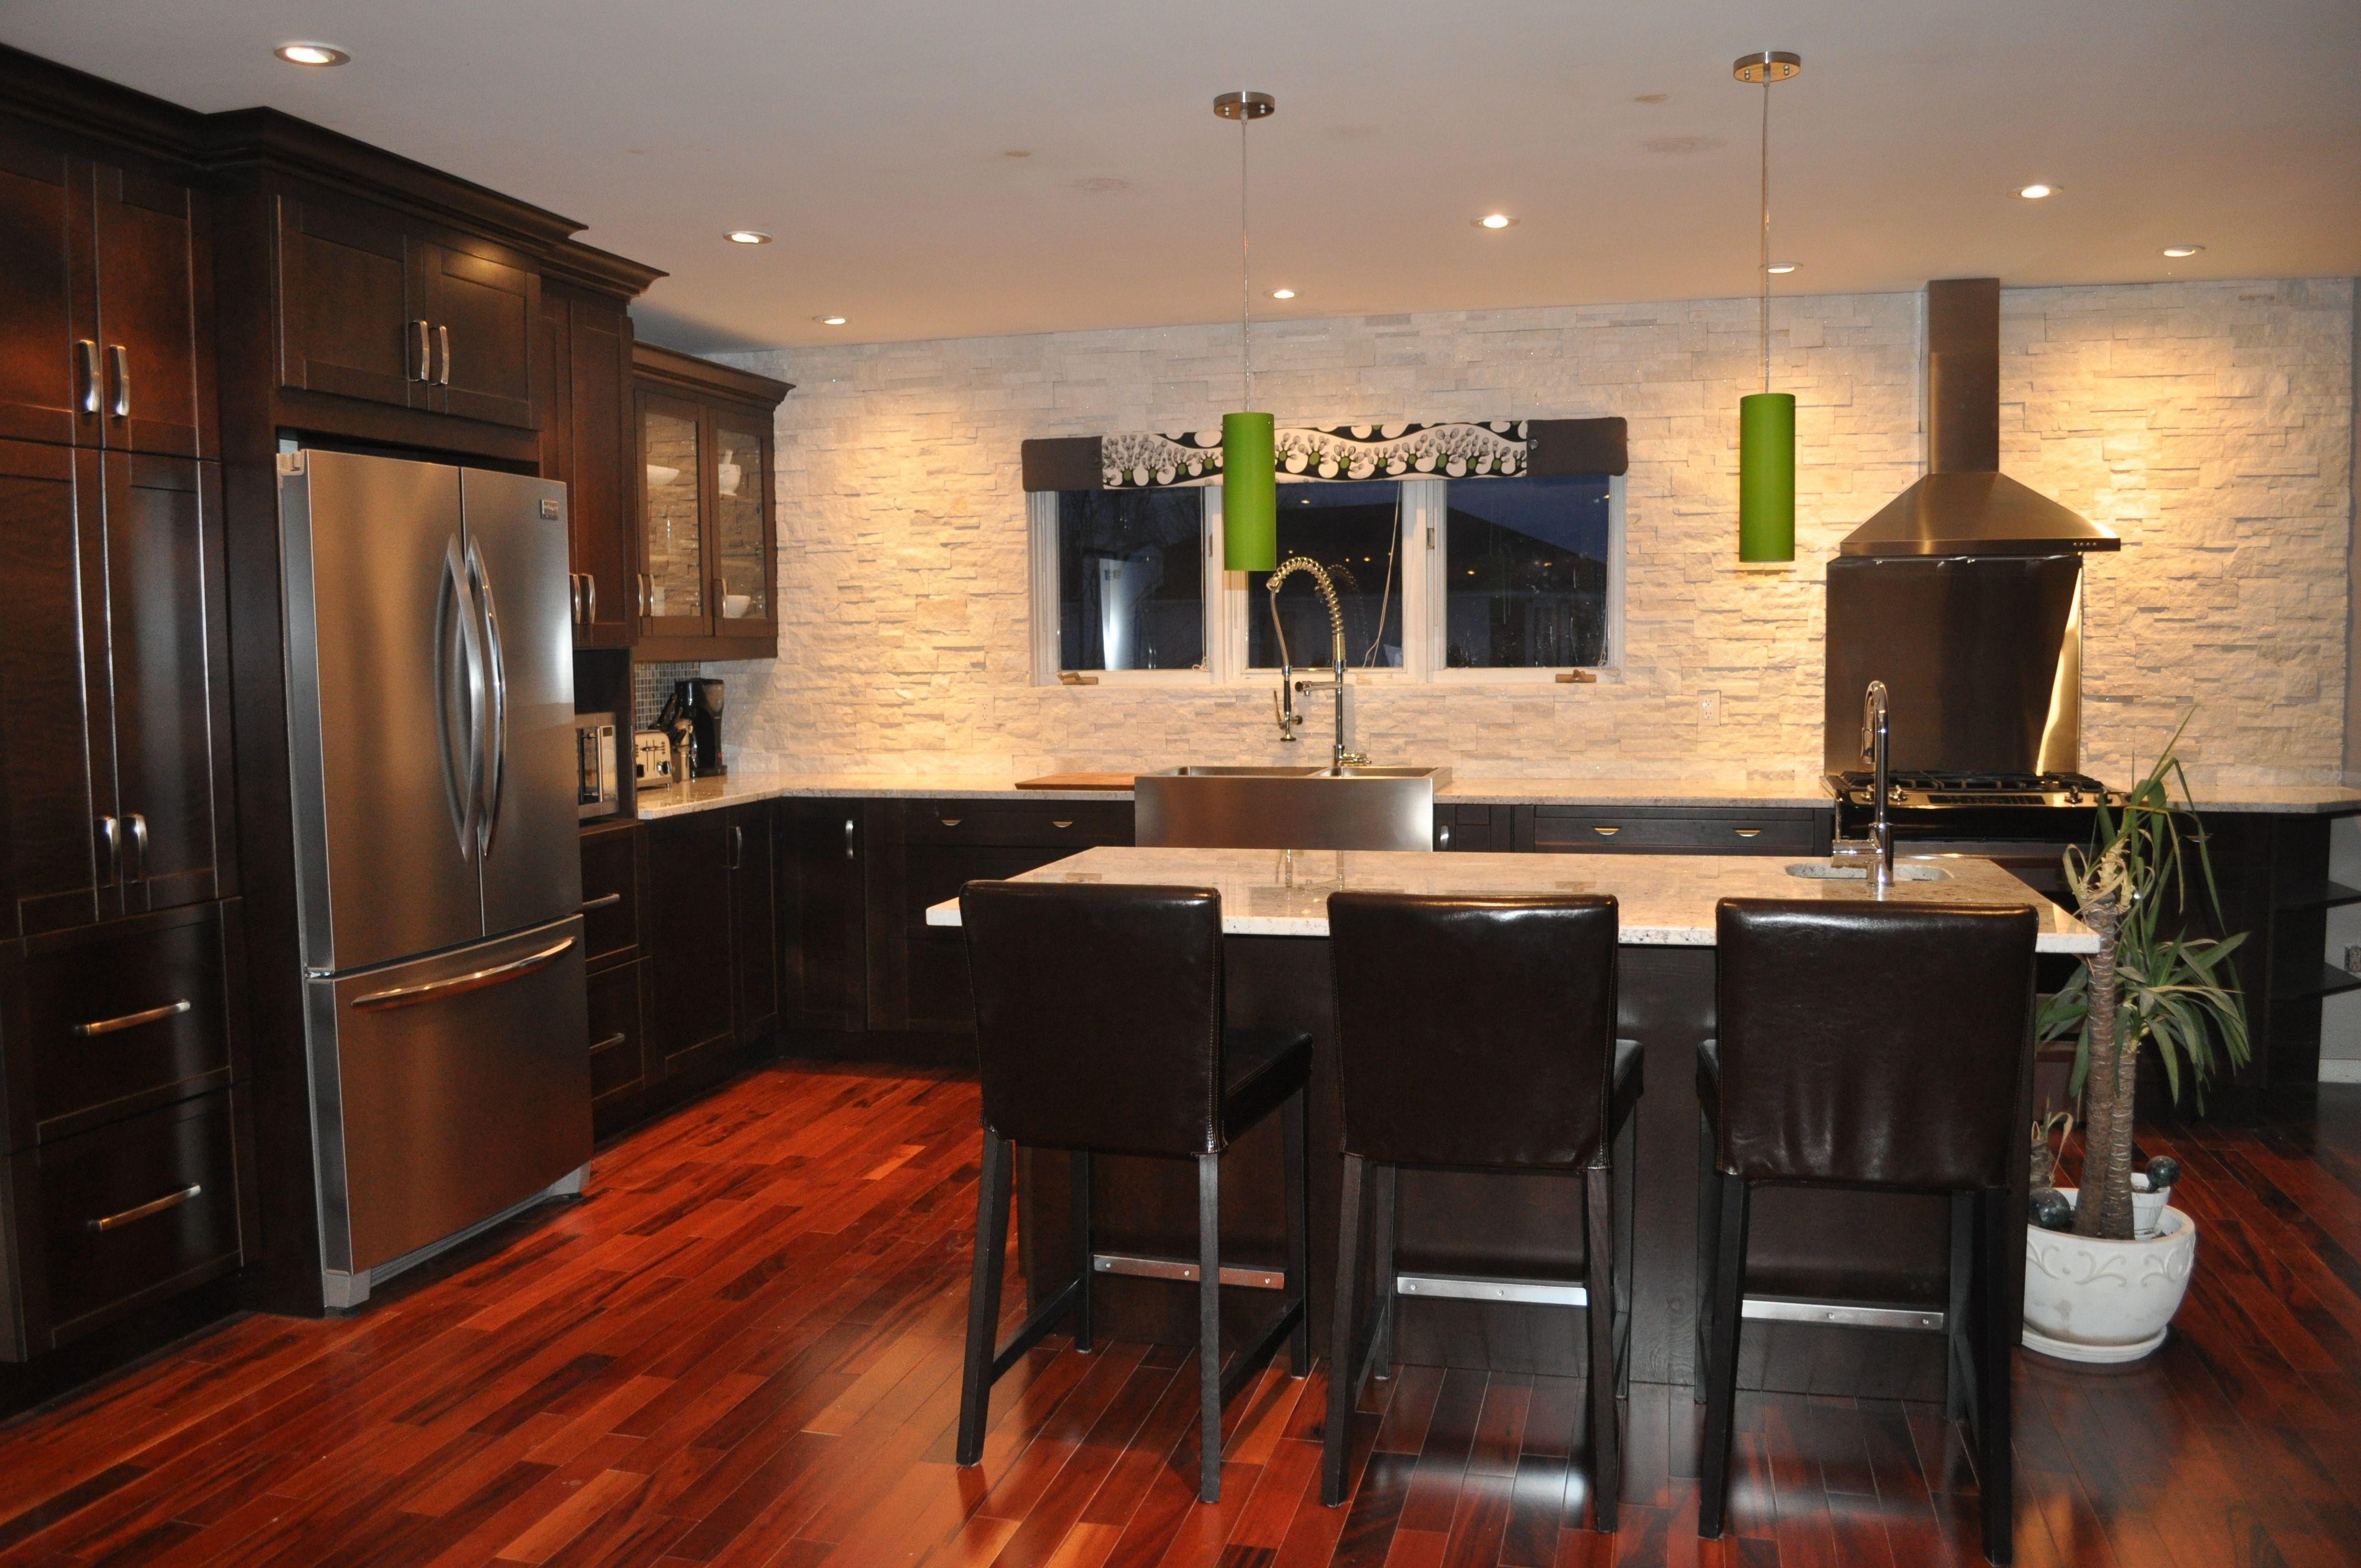 plus also quartz stunning for backsplashes kitchen beautiful white sparkle size gray backsplash of countertop with countertops full kitchens cabinets